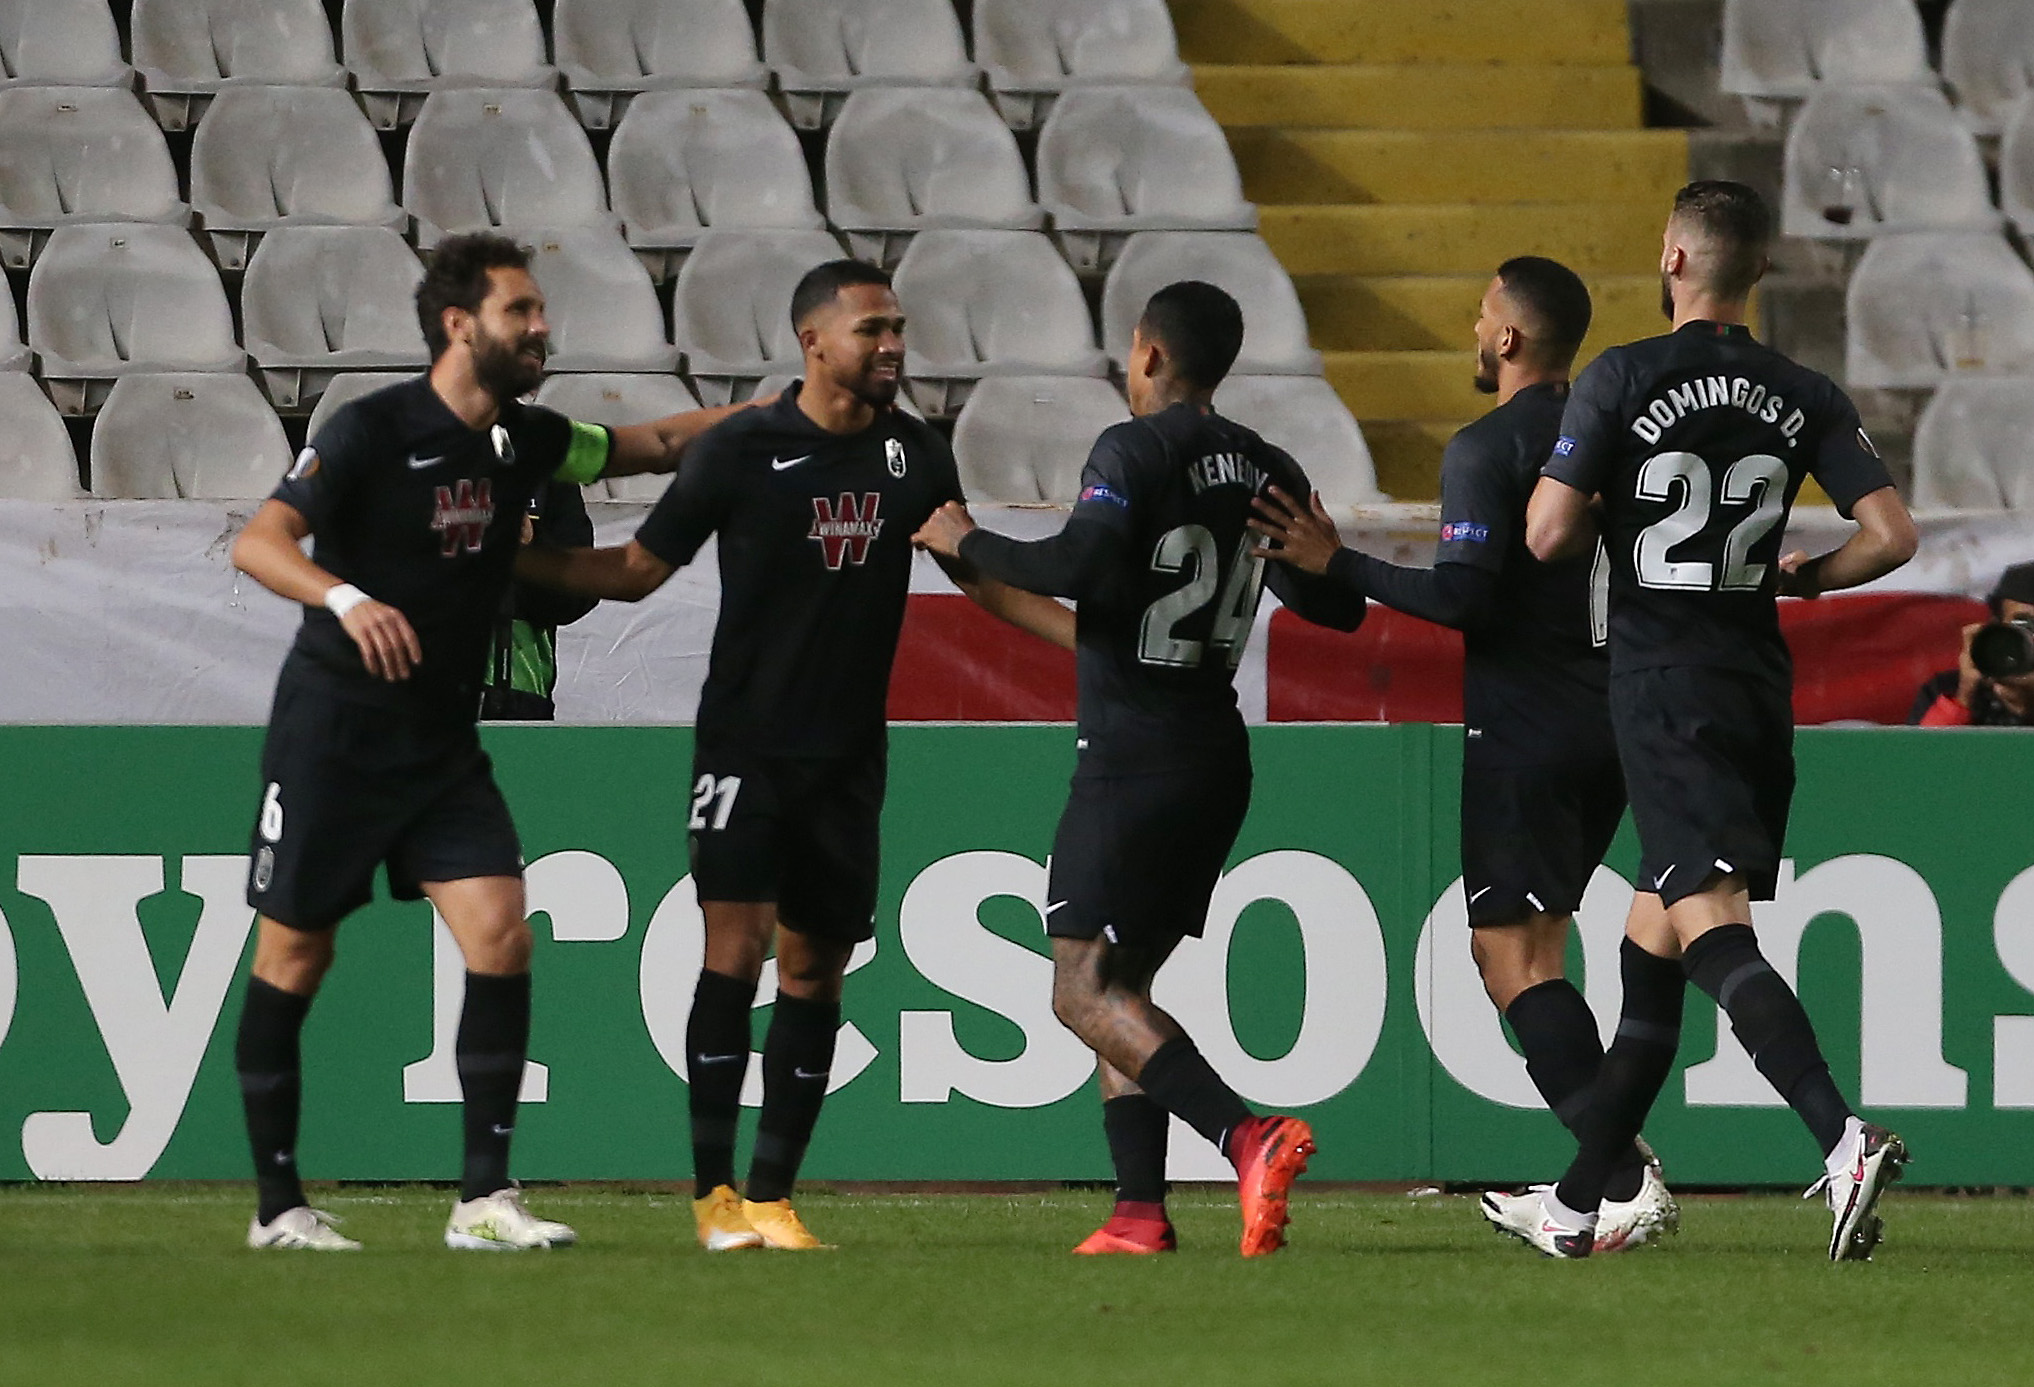 Europa League: Διπλό της Γρανάδα στην Ομόνοια! Στη δεύτερη θέση ο ΠΑΟΚ